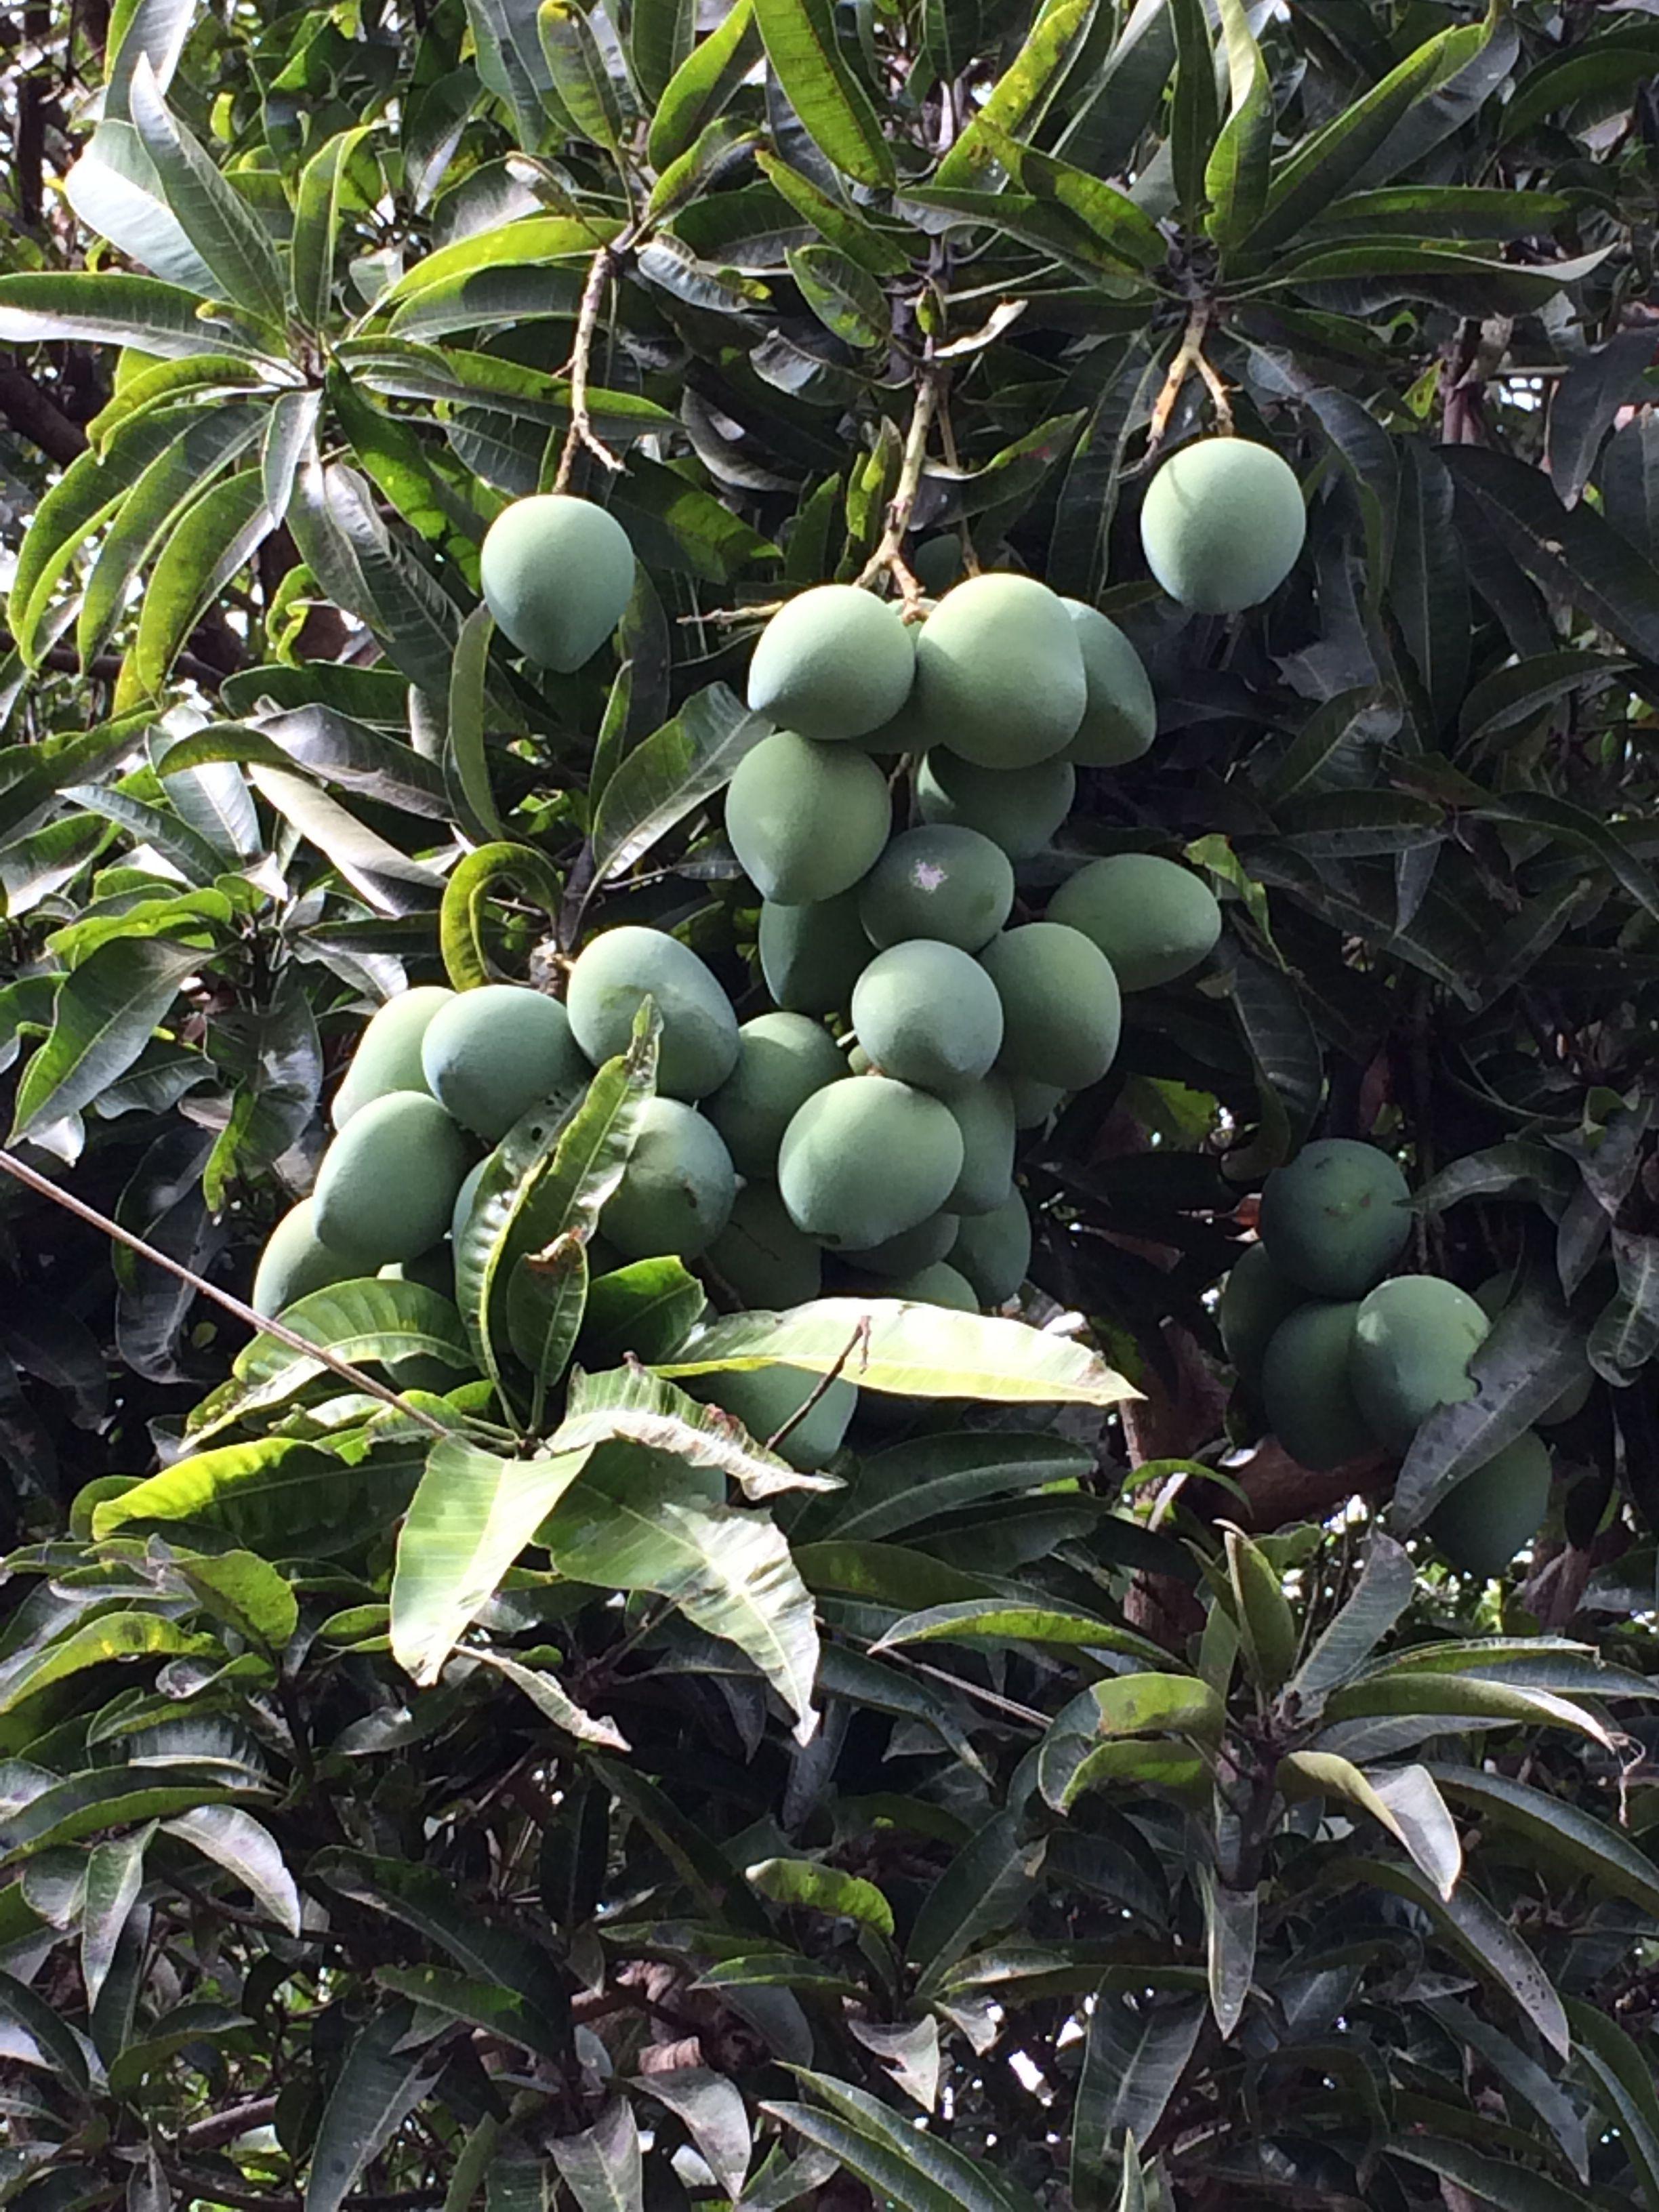 Philippine Indian Mangoes